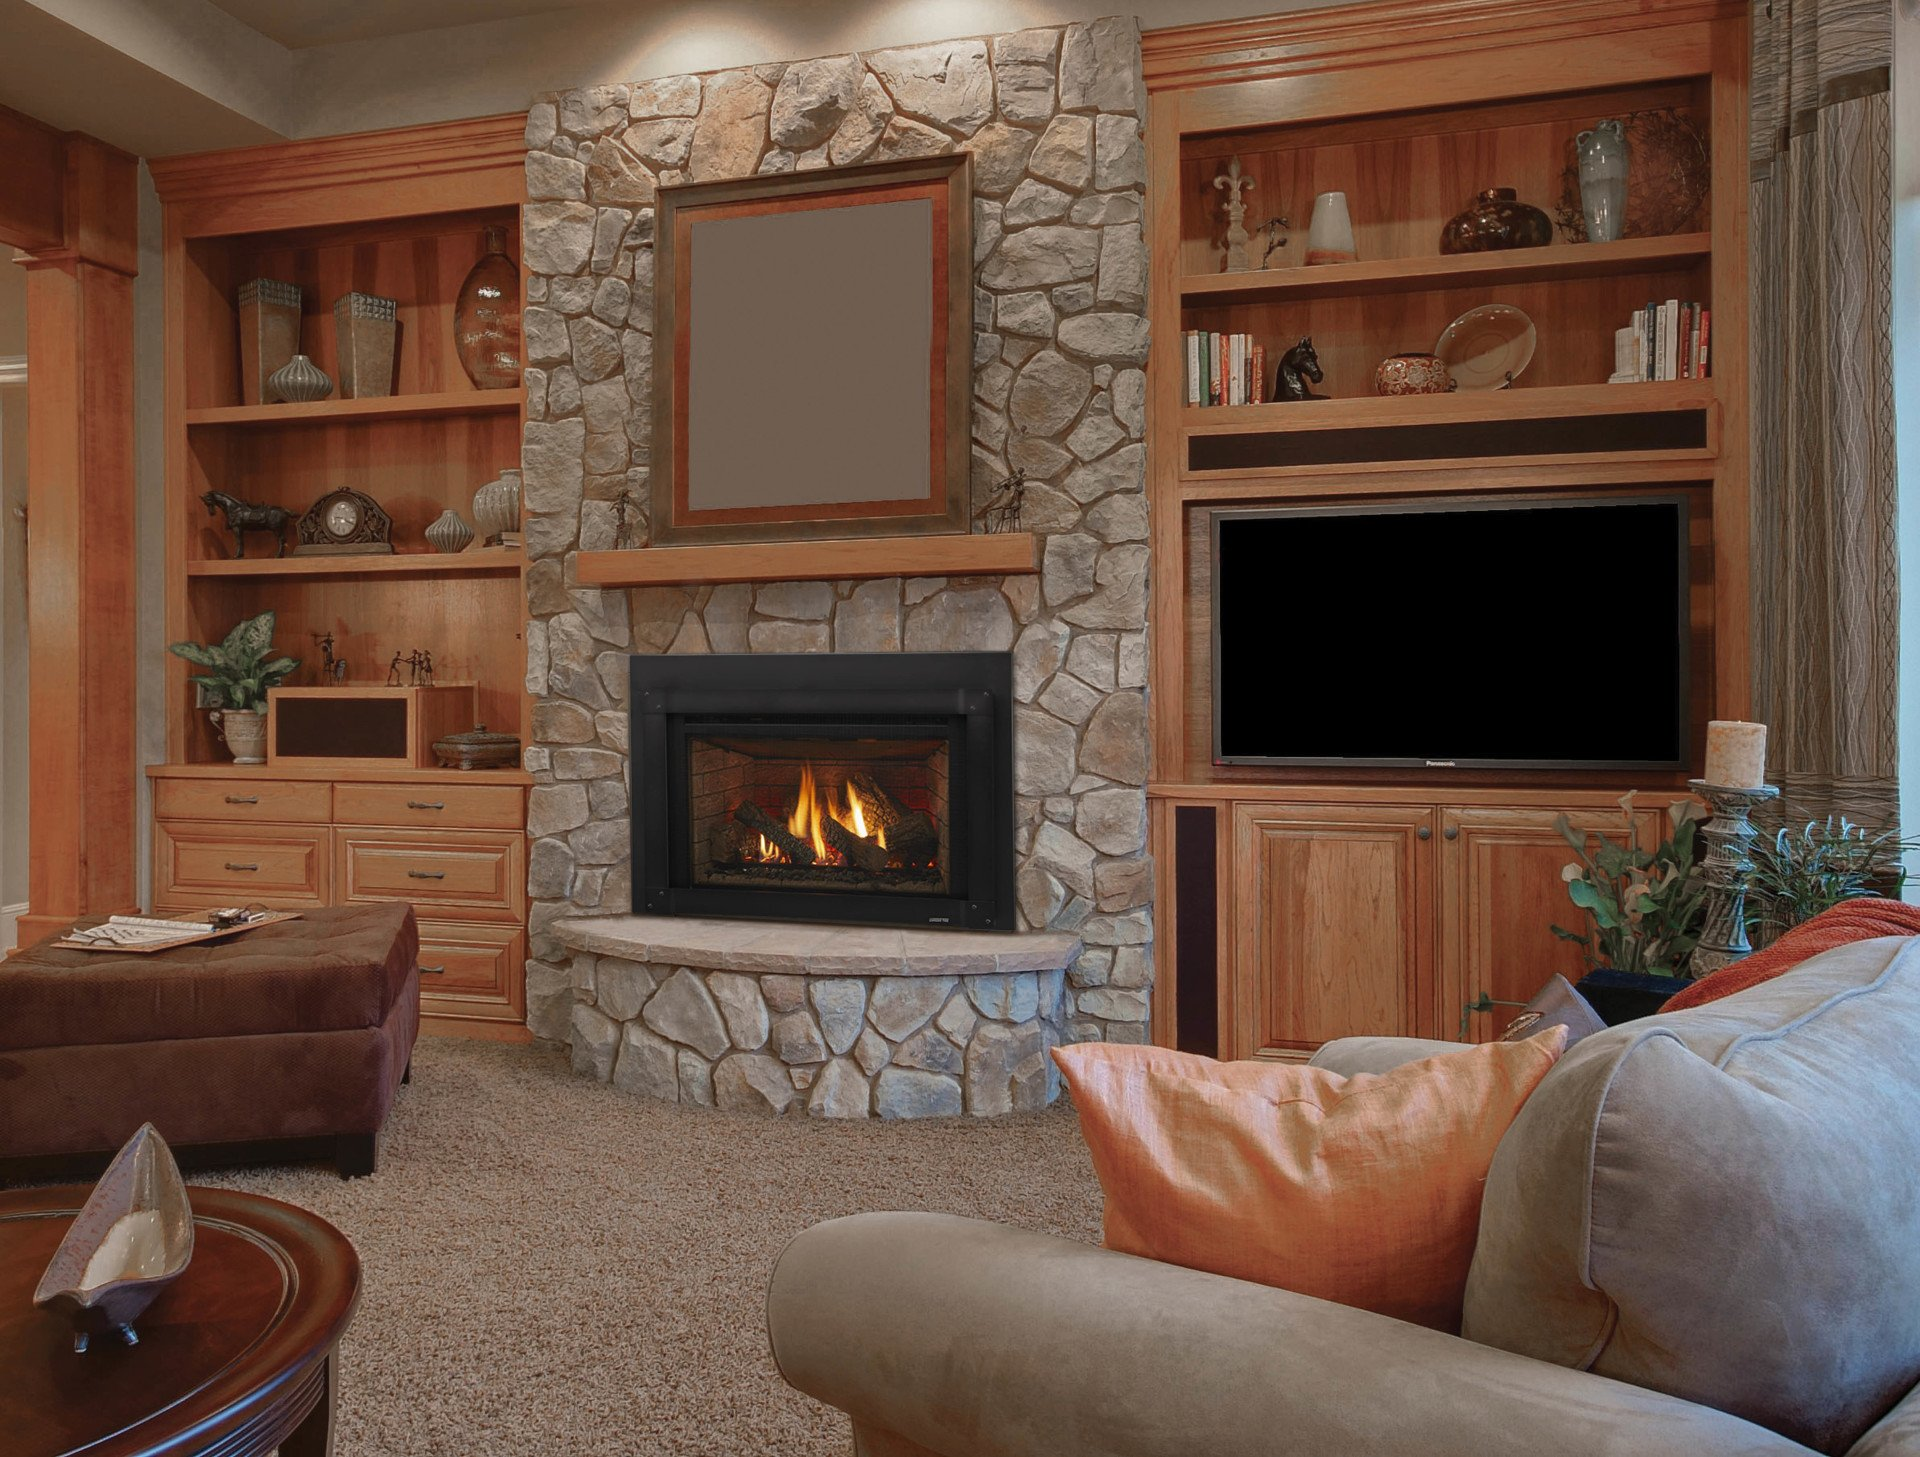 Top Hat Fireplace 15005 Dedeaux Rd Gulfport Ms